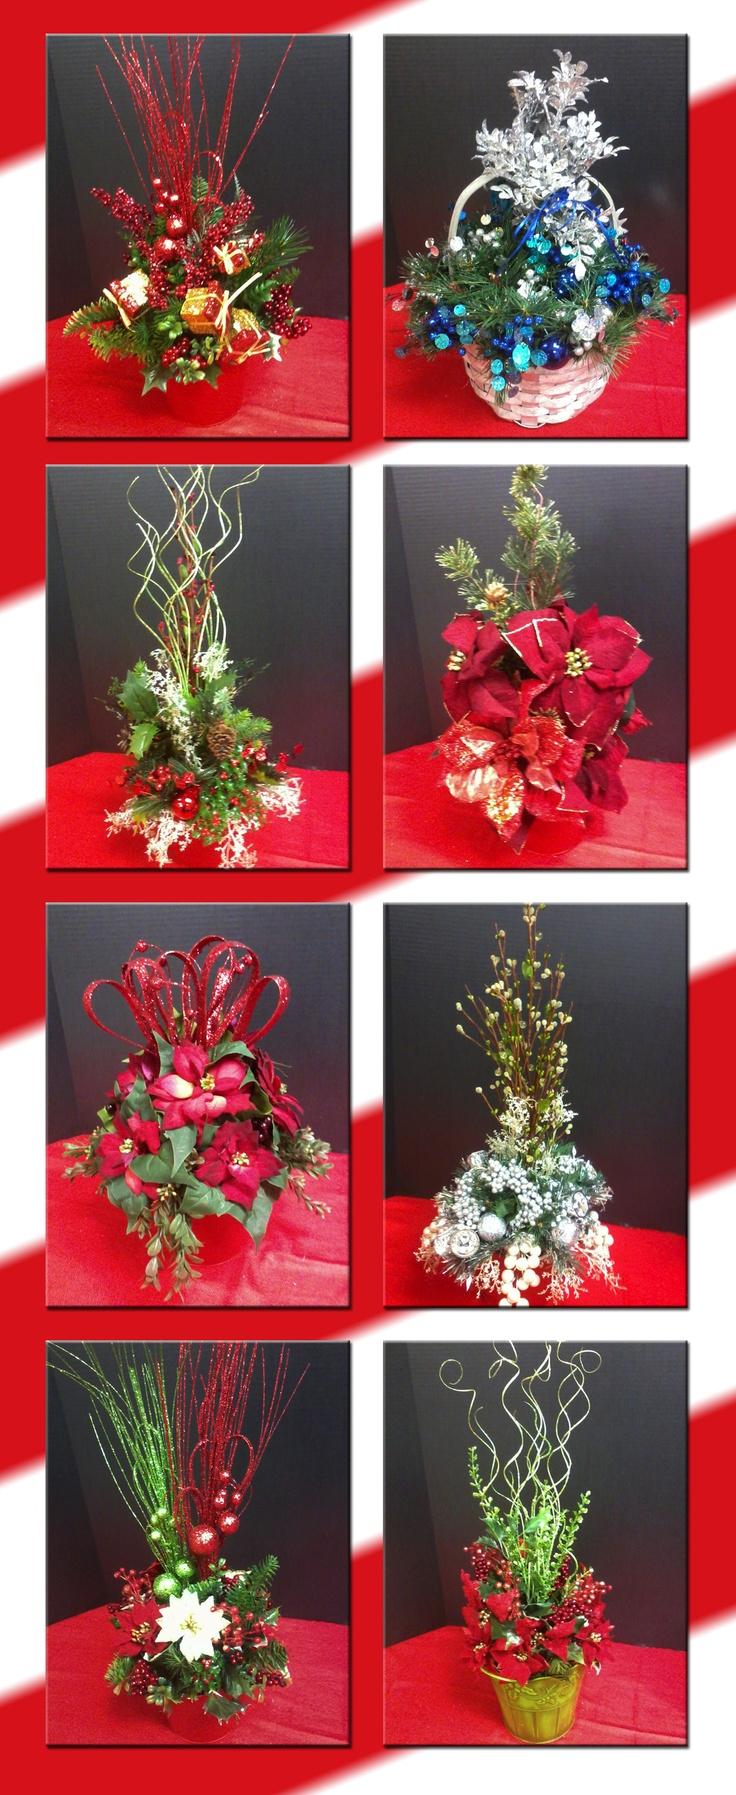 Some more Christmas tabletops